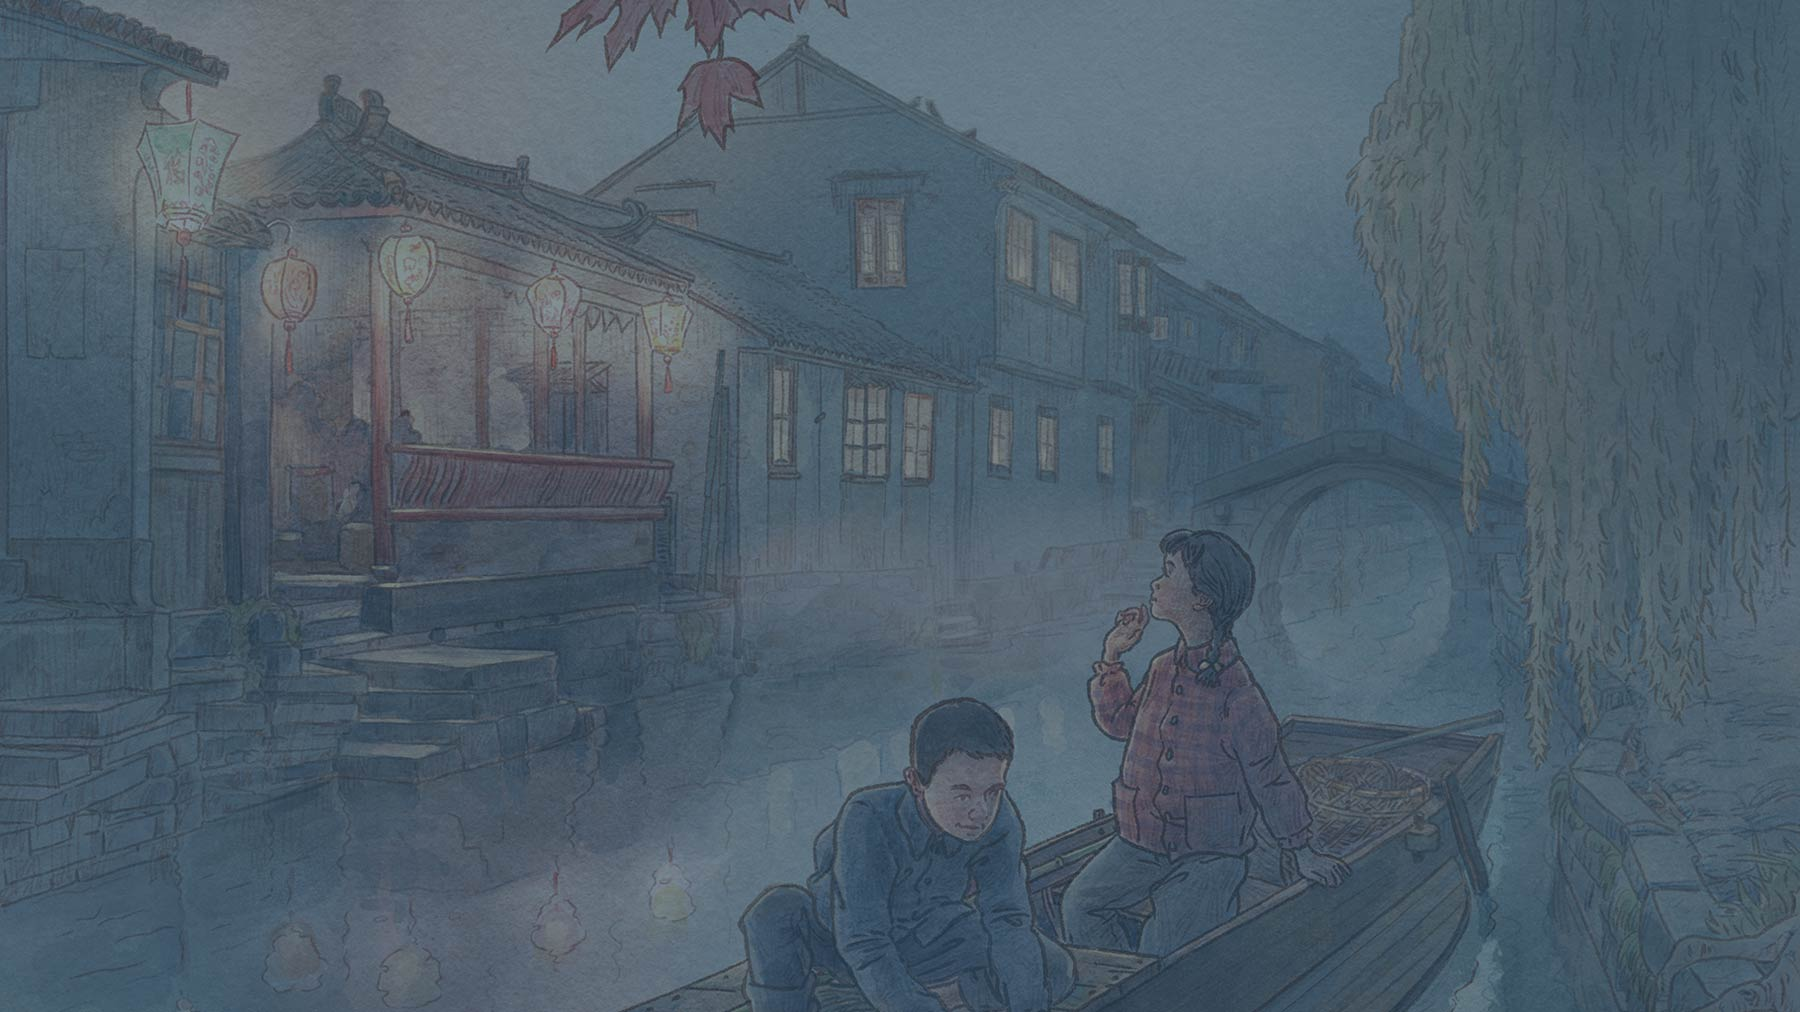 Maplewood Ford - Artwork for Hans Christian Andersen Award winner Cao Wenxuan's latest novel.